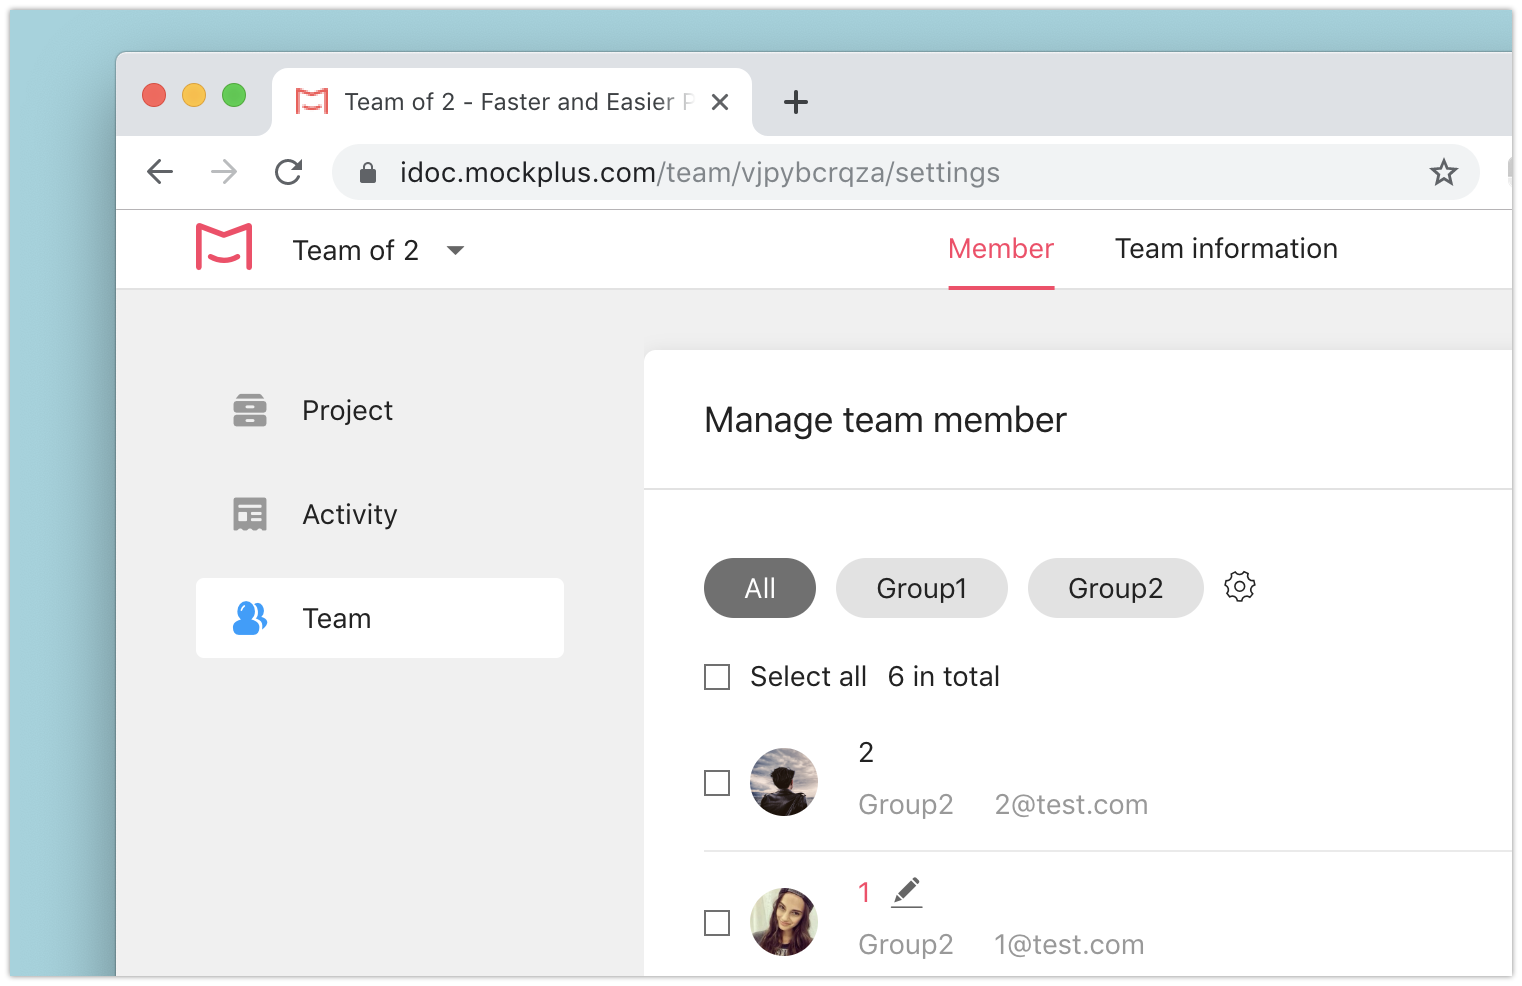 Manage team member